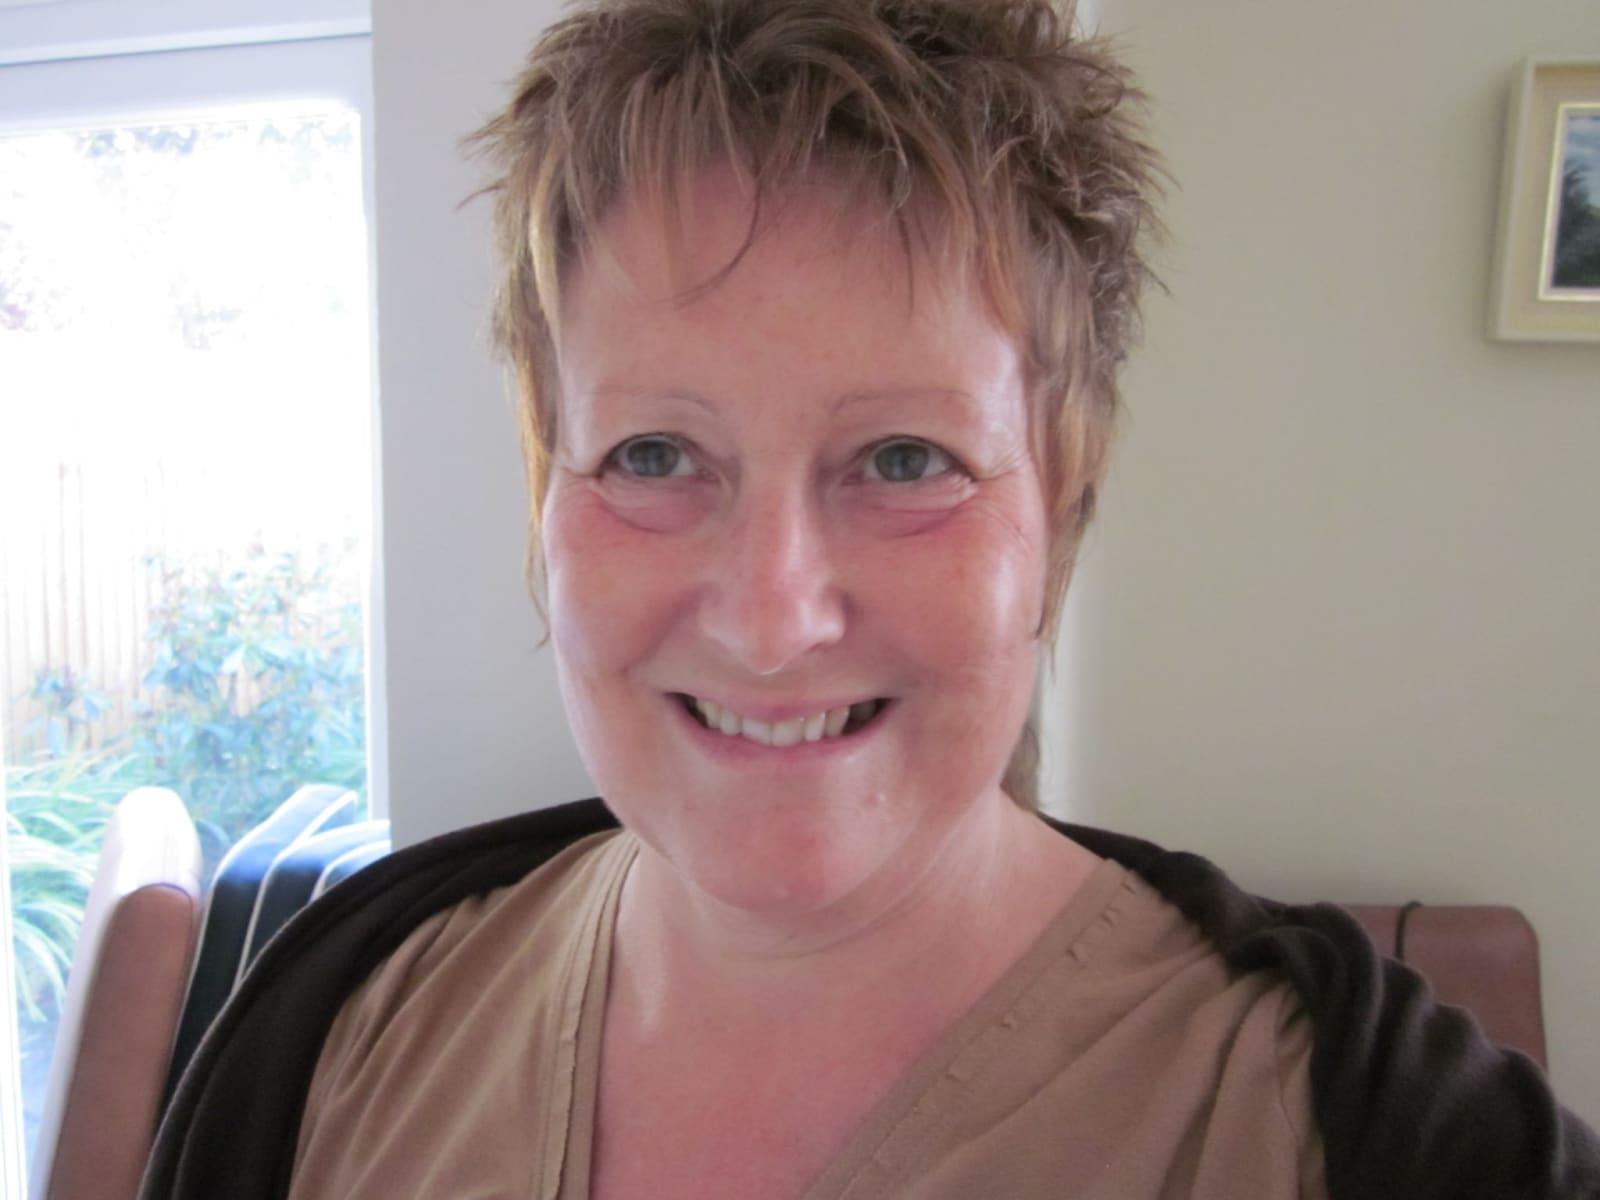 Susie from Swindon, United Kingdom